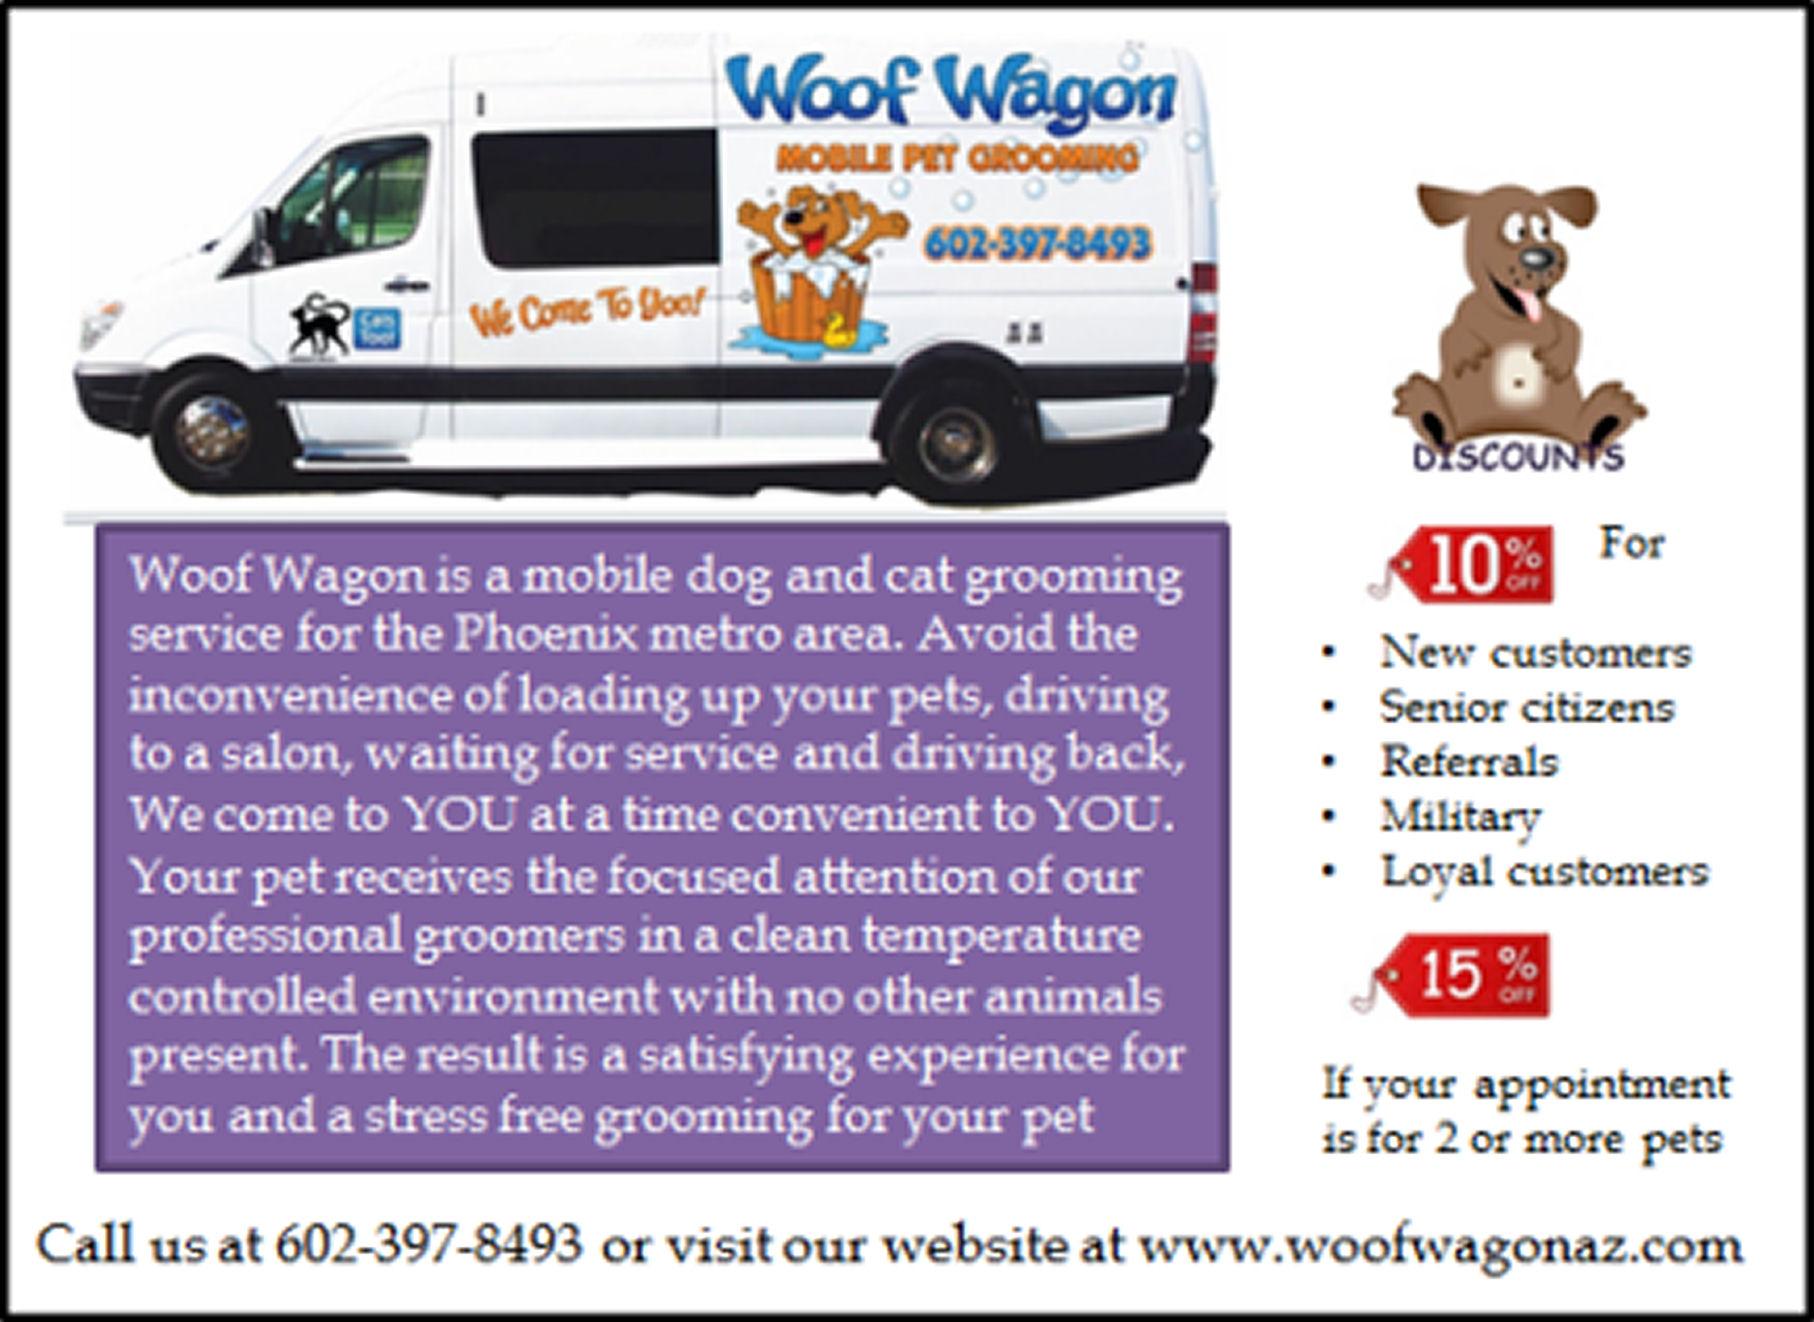 Woof Wagon image 4